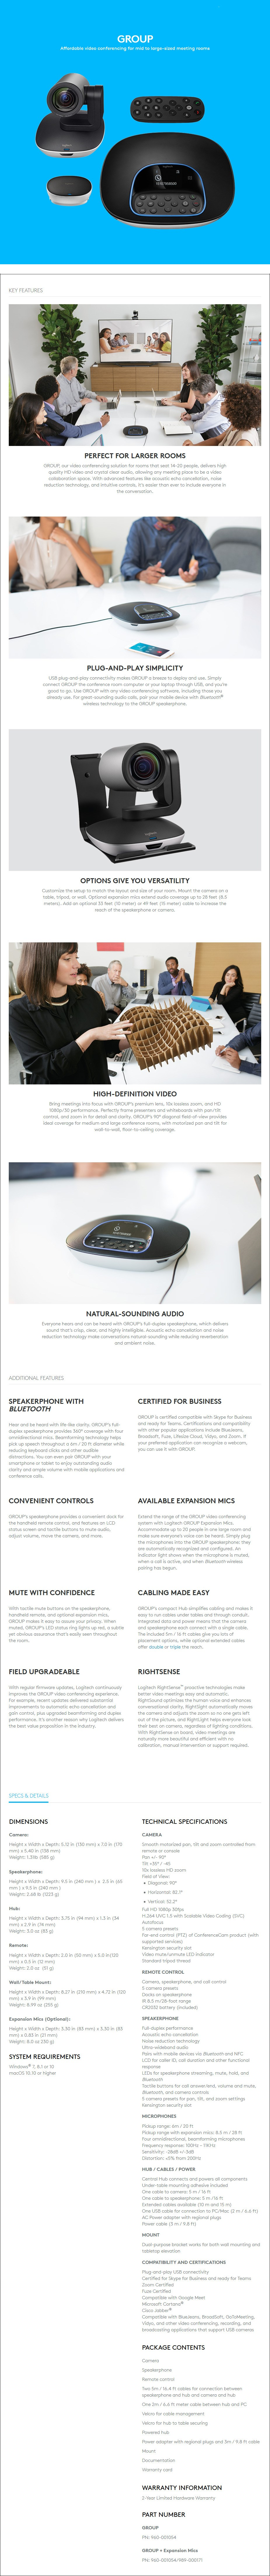 Intel NUC Logitech Video Conference Bundle Deal - Medium Room - Overview 3